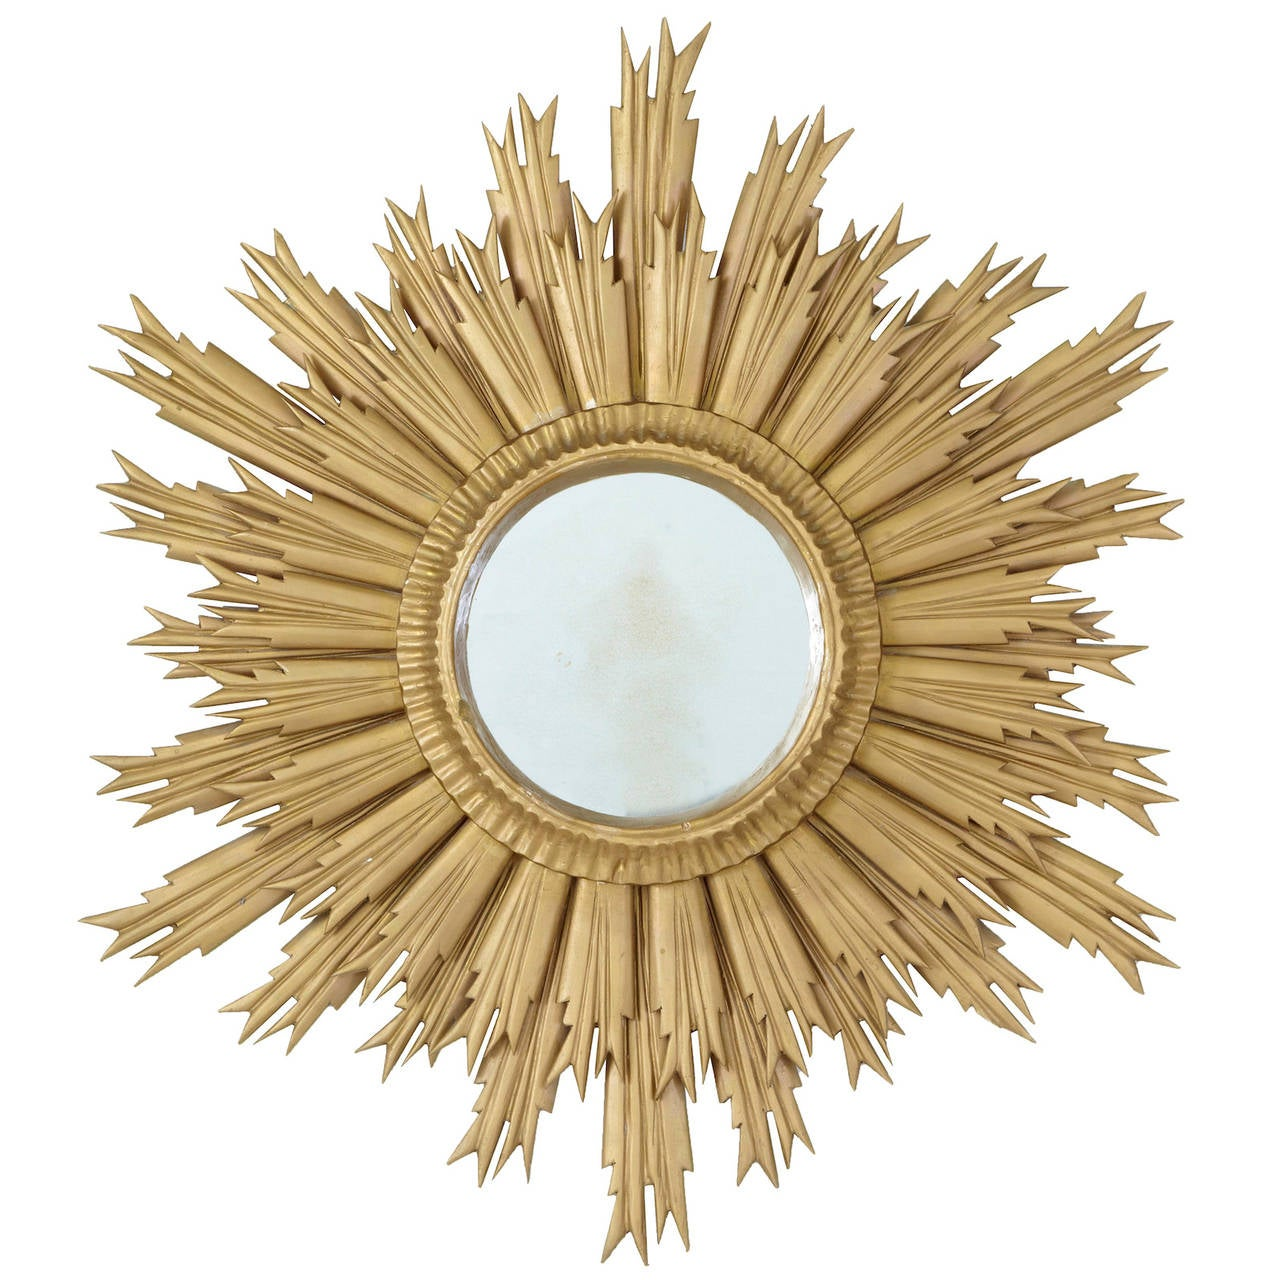 20th century late art deco sunburst mirror for sale at 1stdibs for Miroir art deco